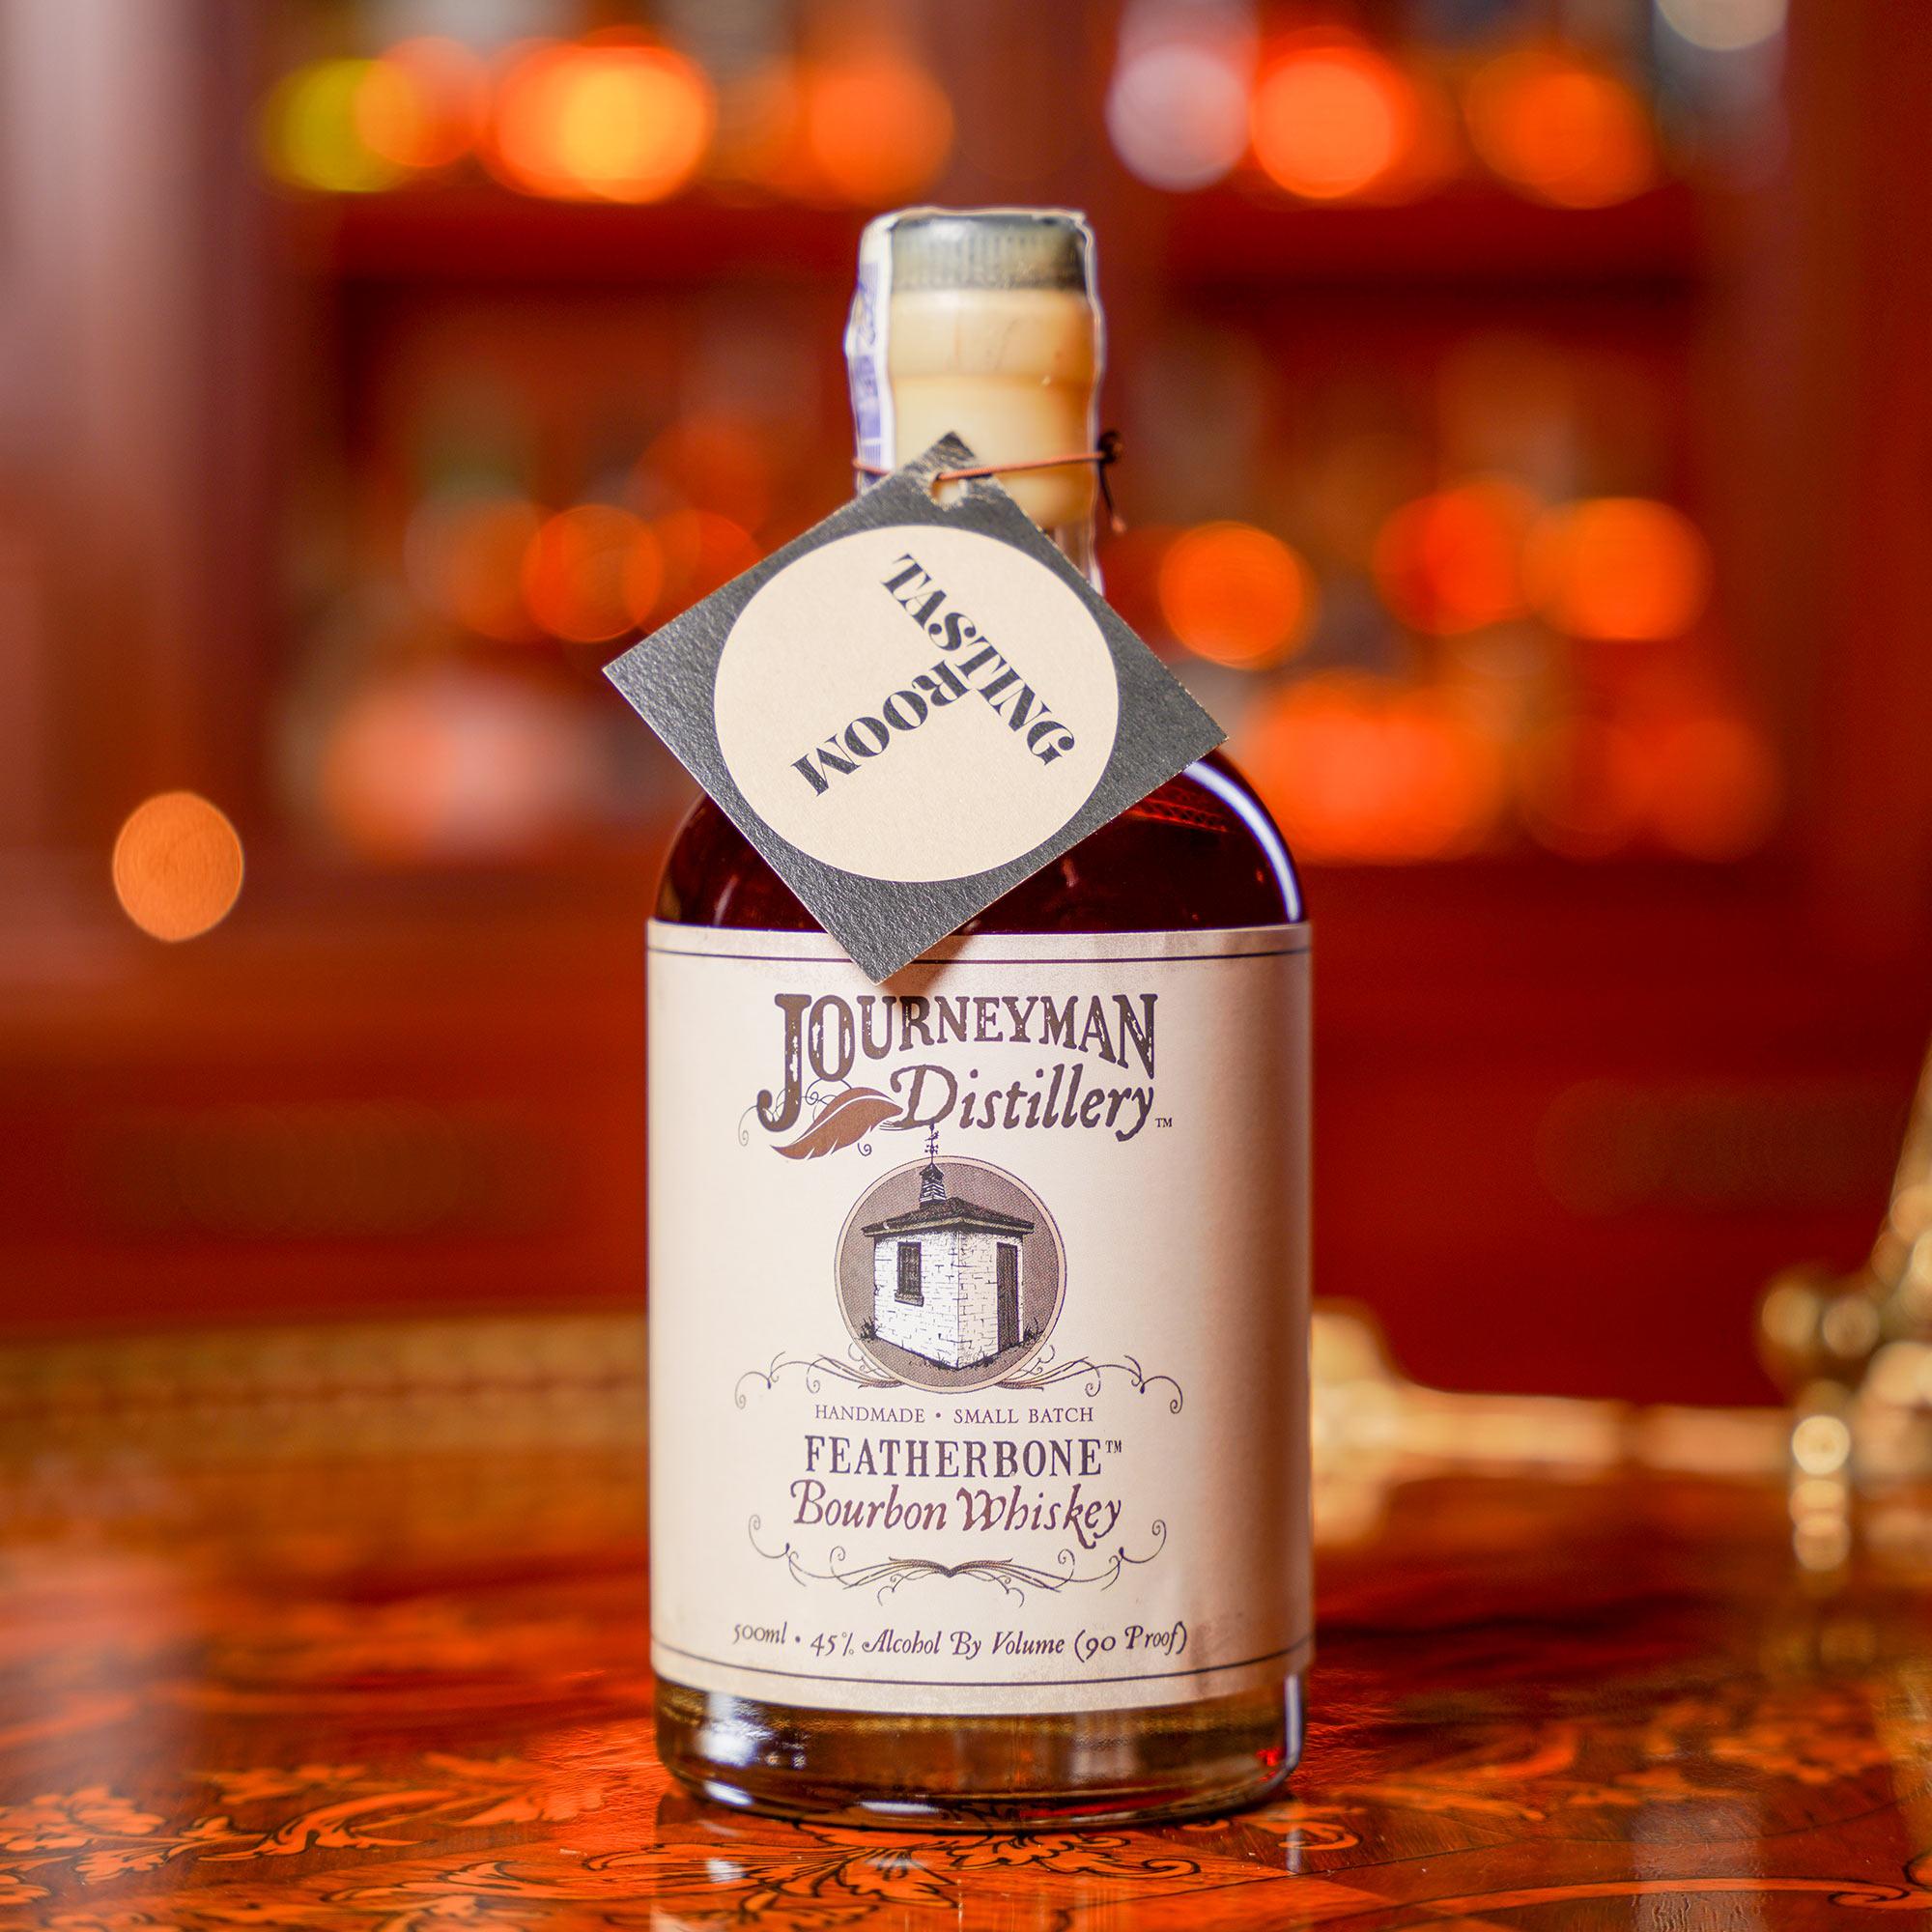 Journeyman Featherbone Bourbon /Джърнимен Федърбоун Бърбън